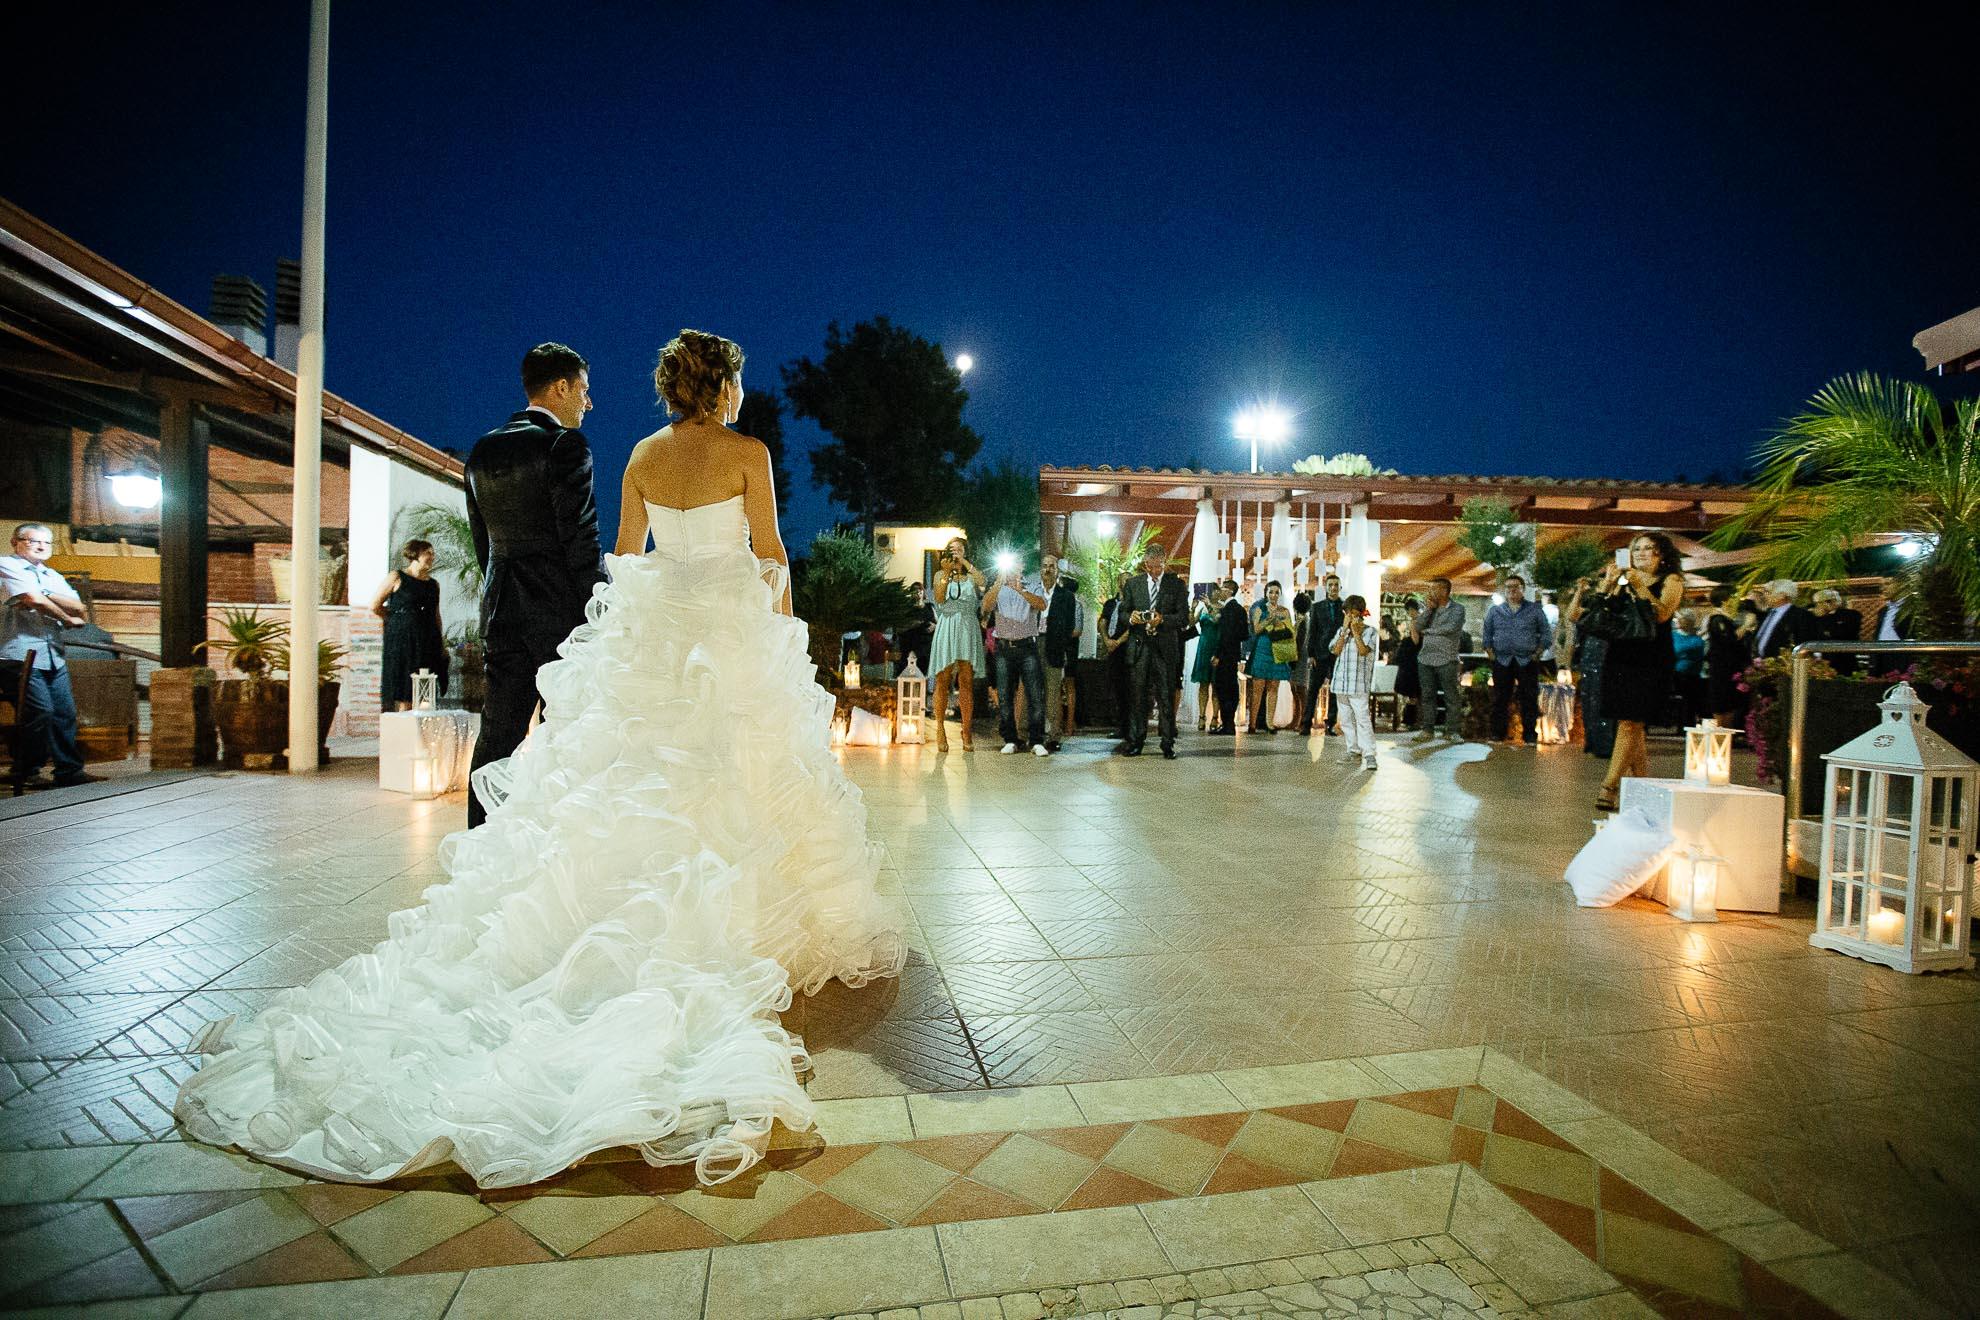 Matrimonio a Carbonia - Tanit - Ristorante a Carbonia dal 1981 (2)